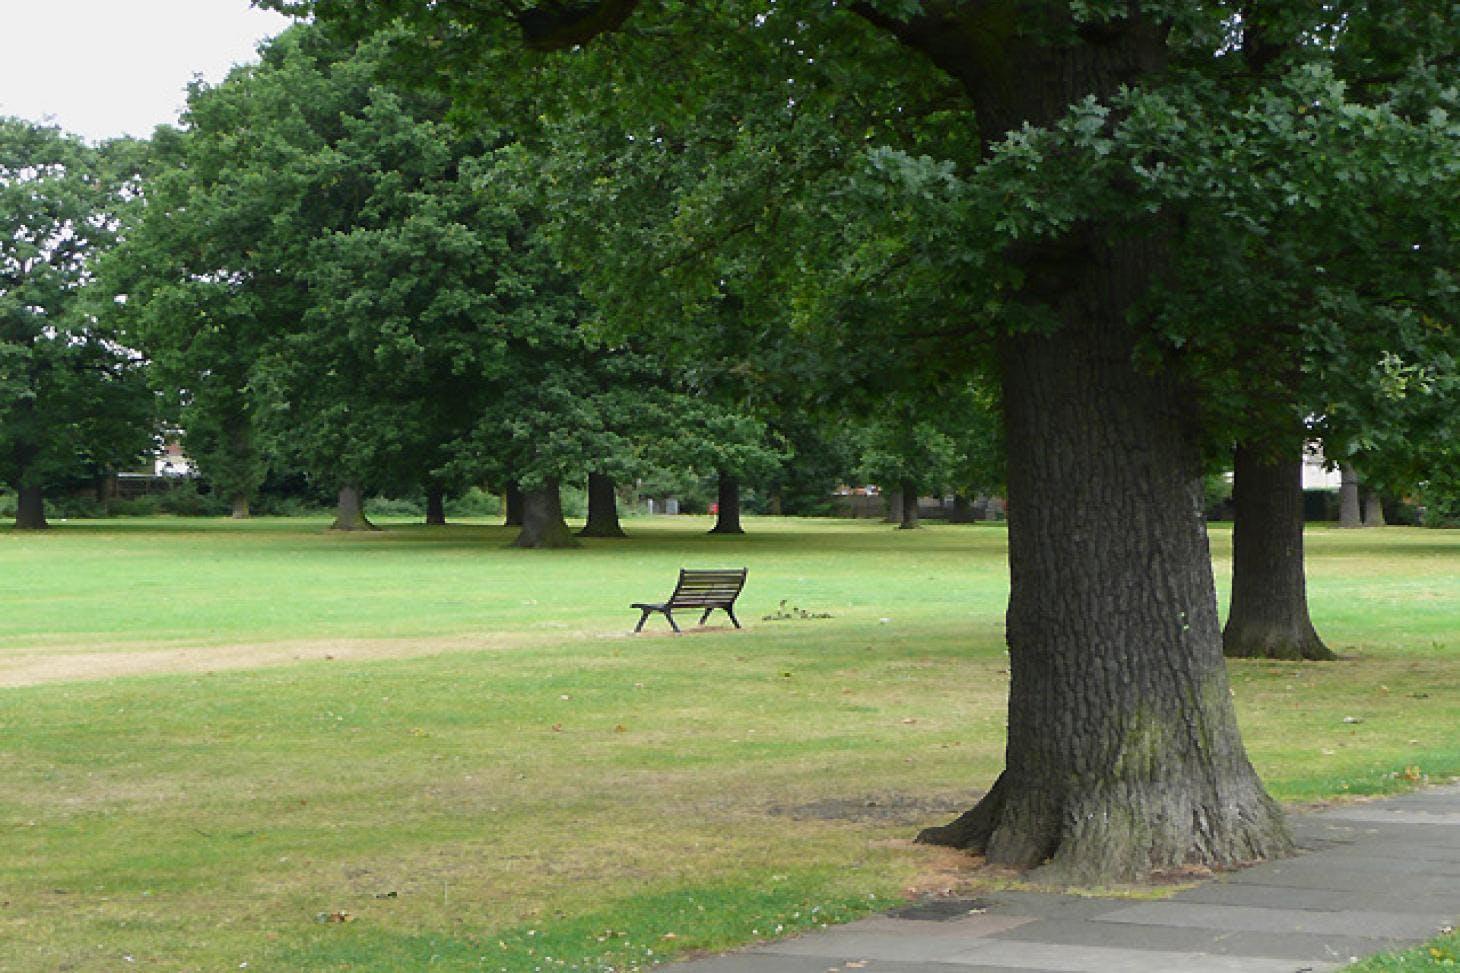 Longlands Recreation Ground 11 a side | Grass football pitch